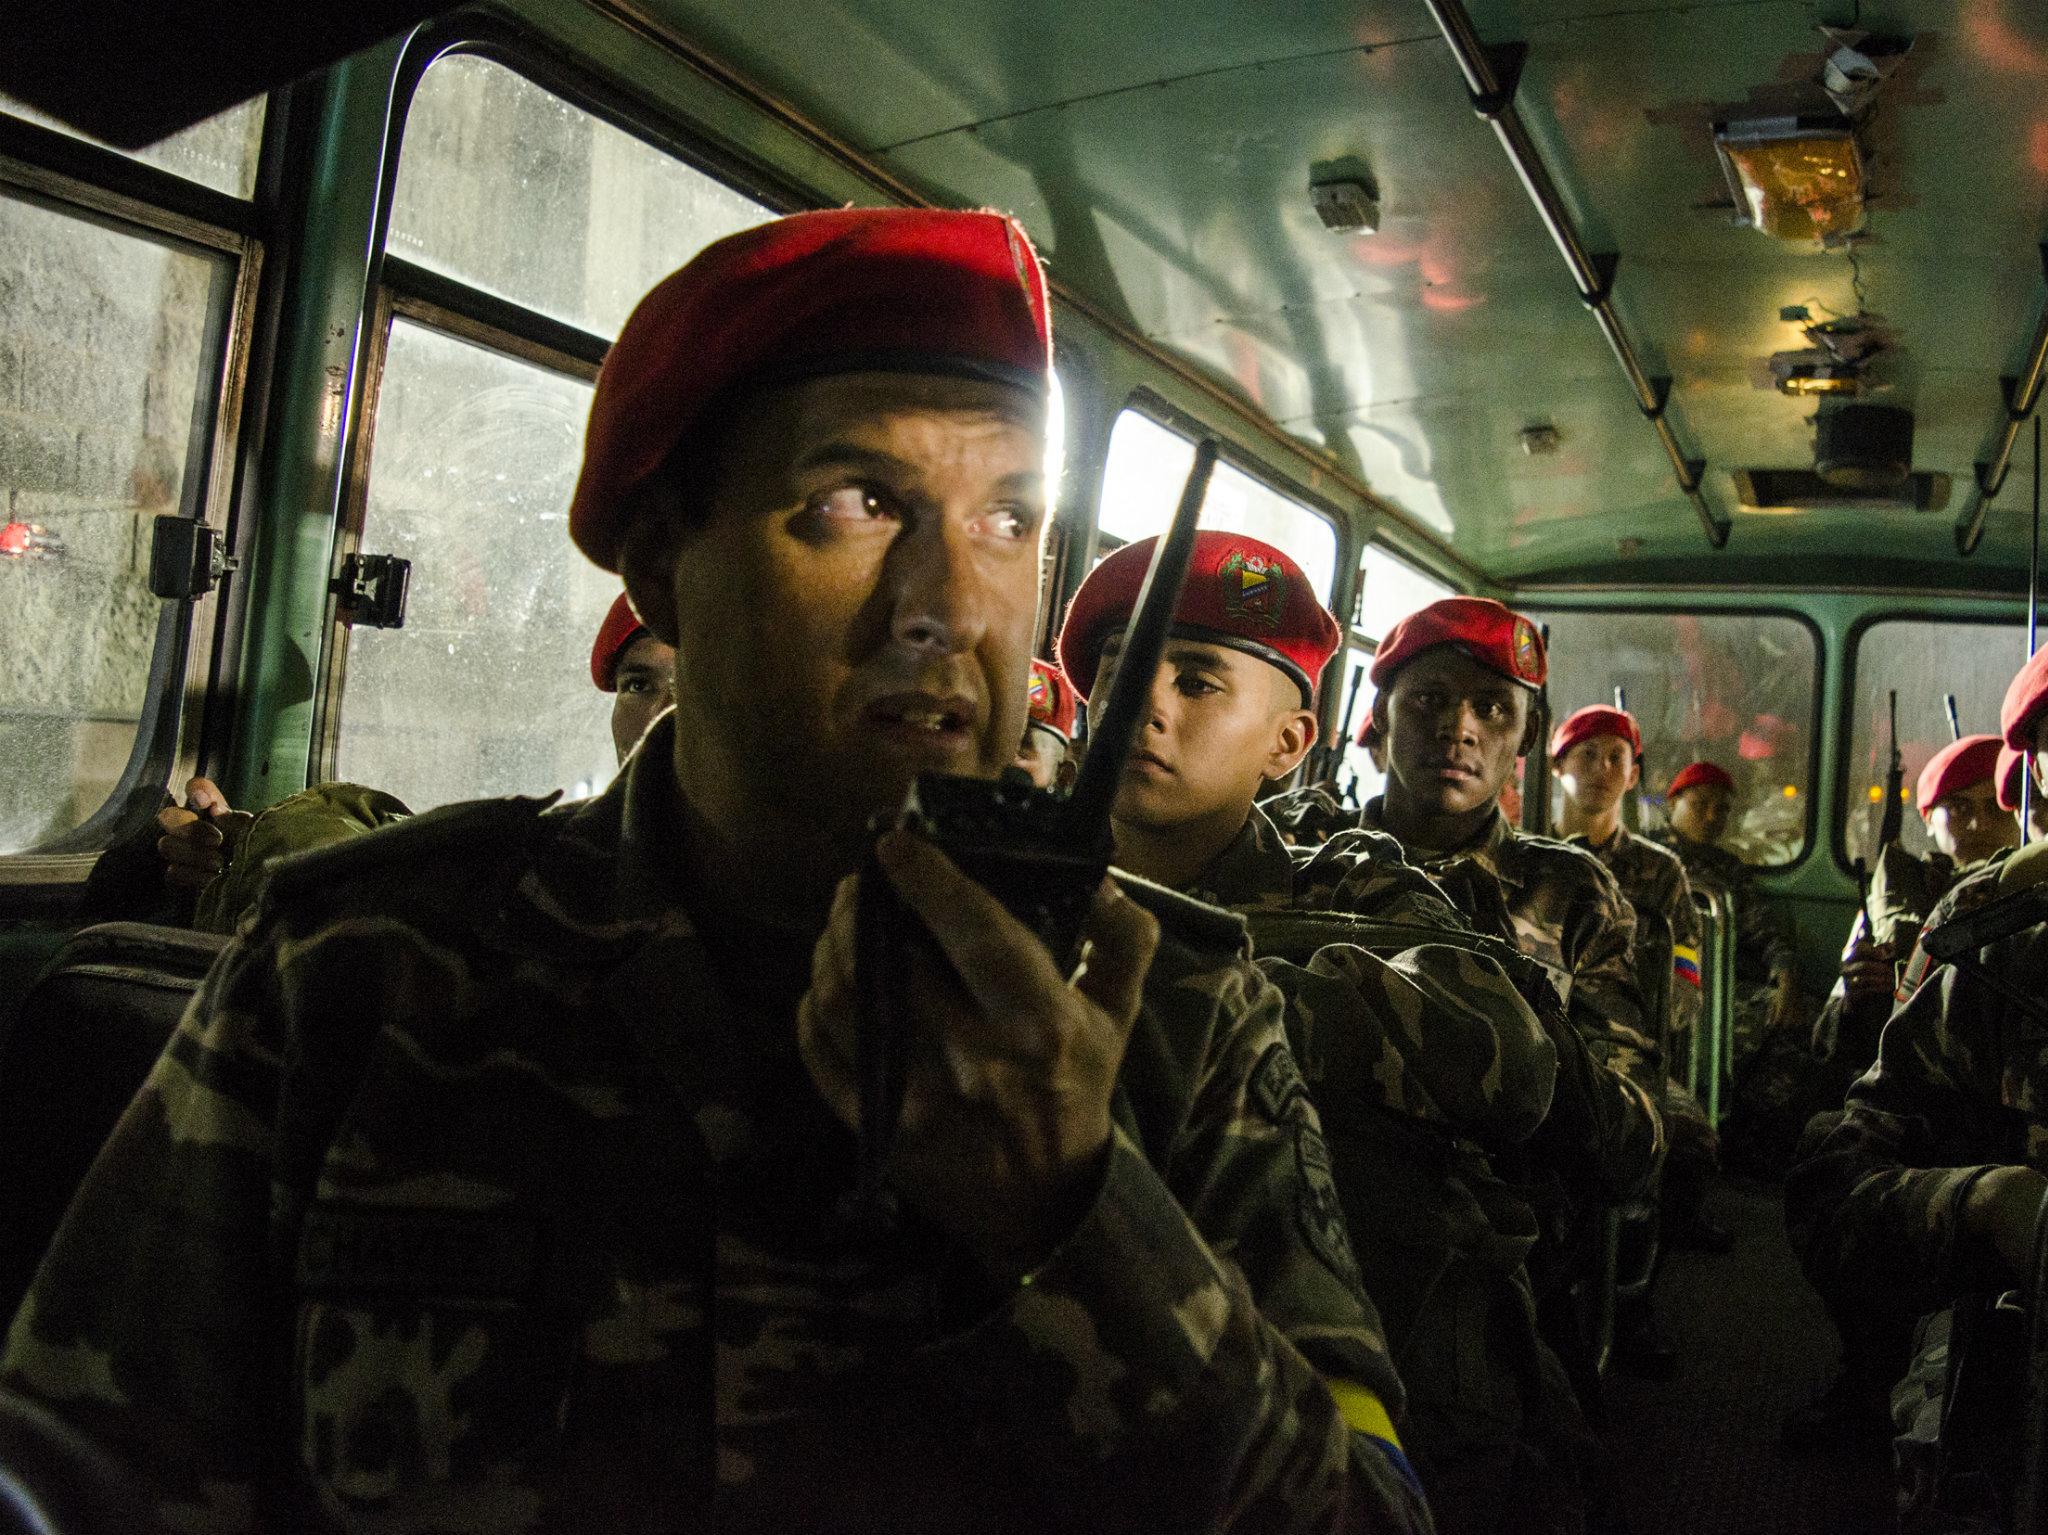 Set visit: El comandante